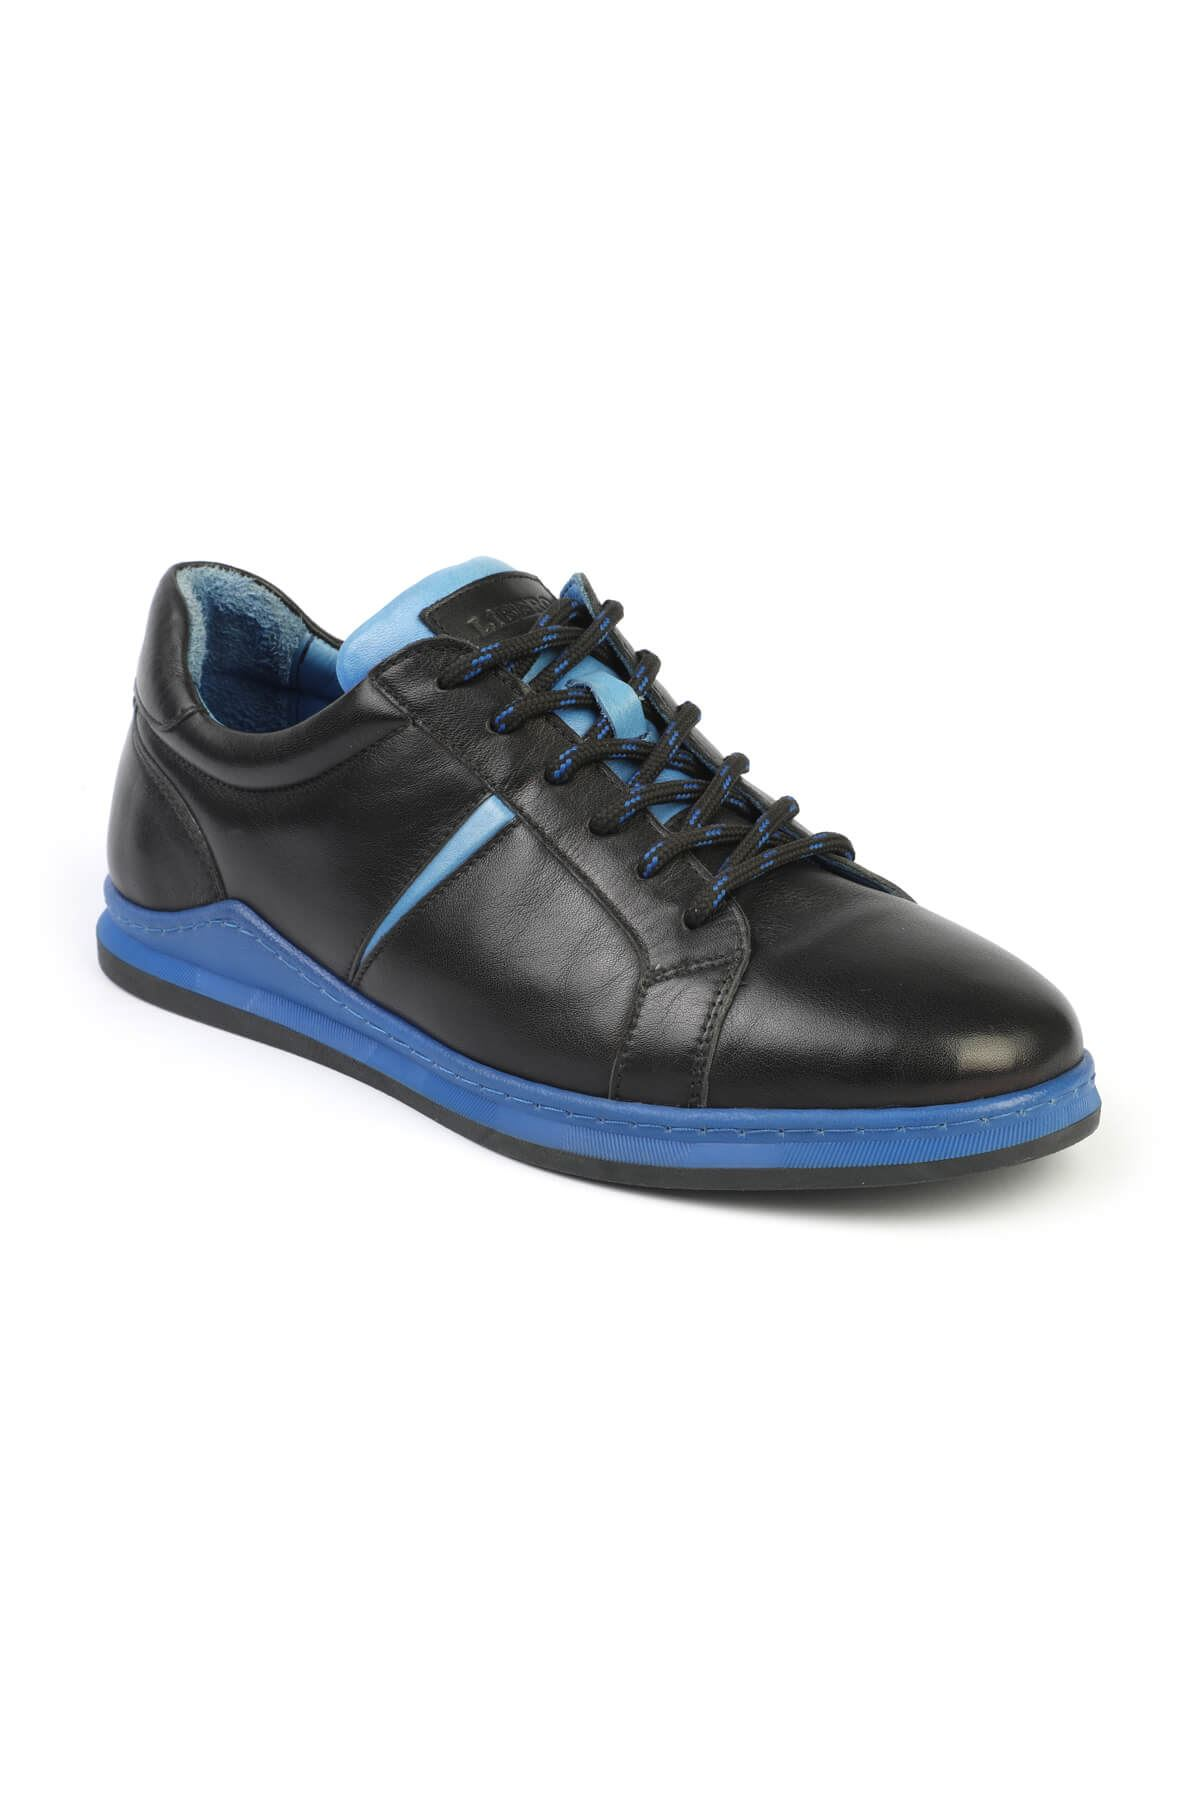 Libero 3196 Black Blue Sneaker Shoes